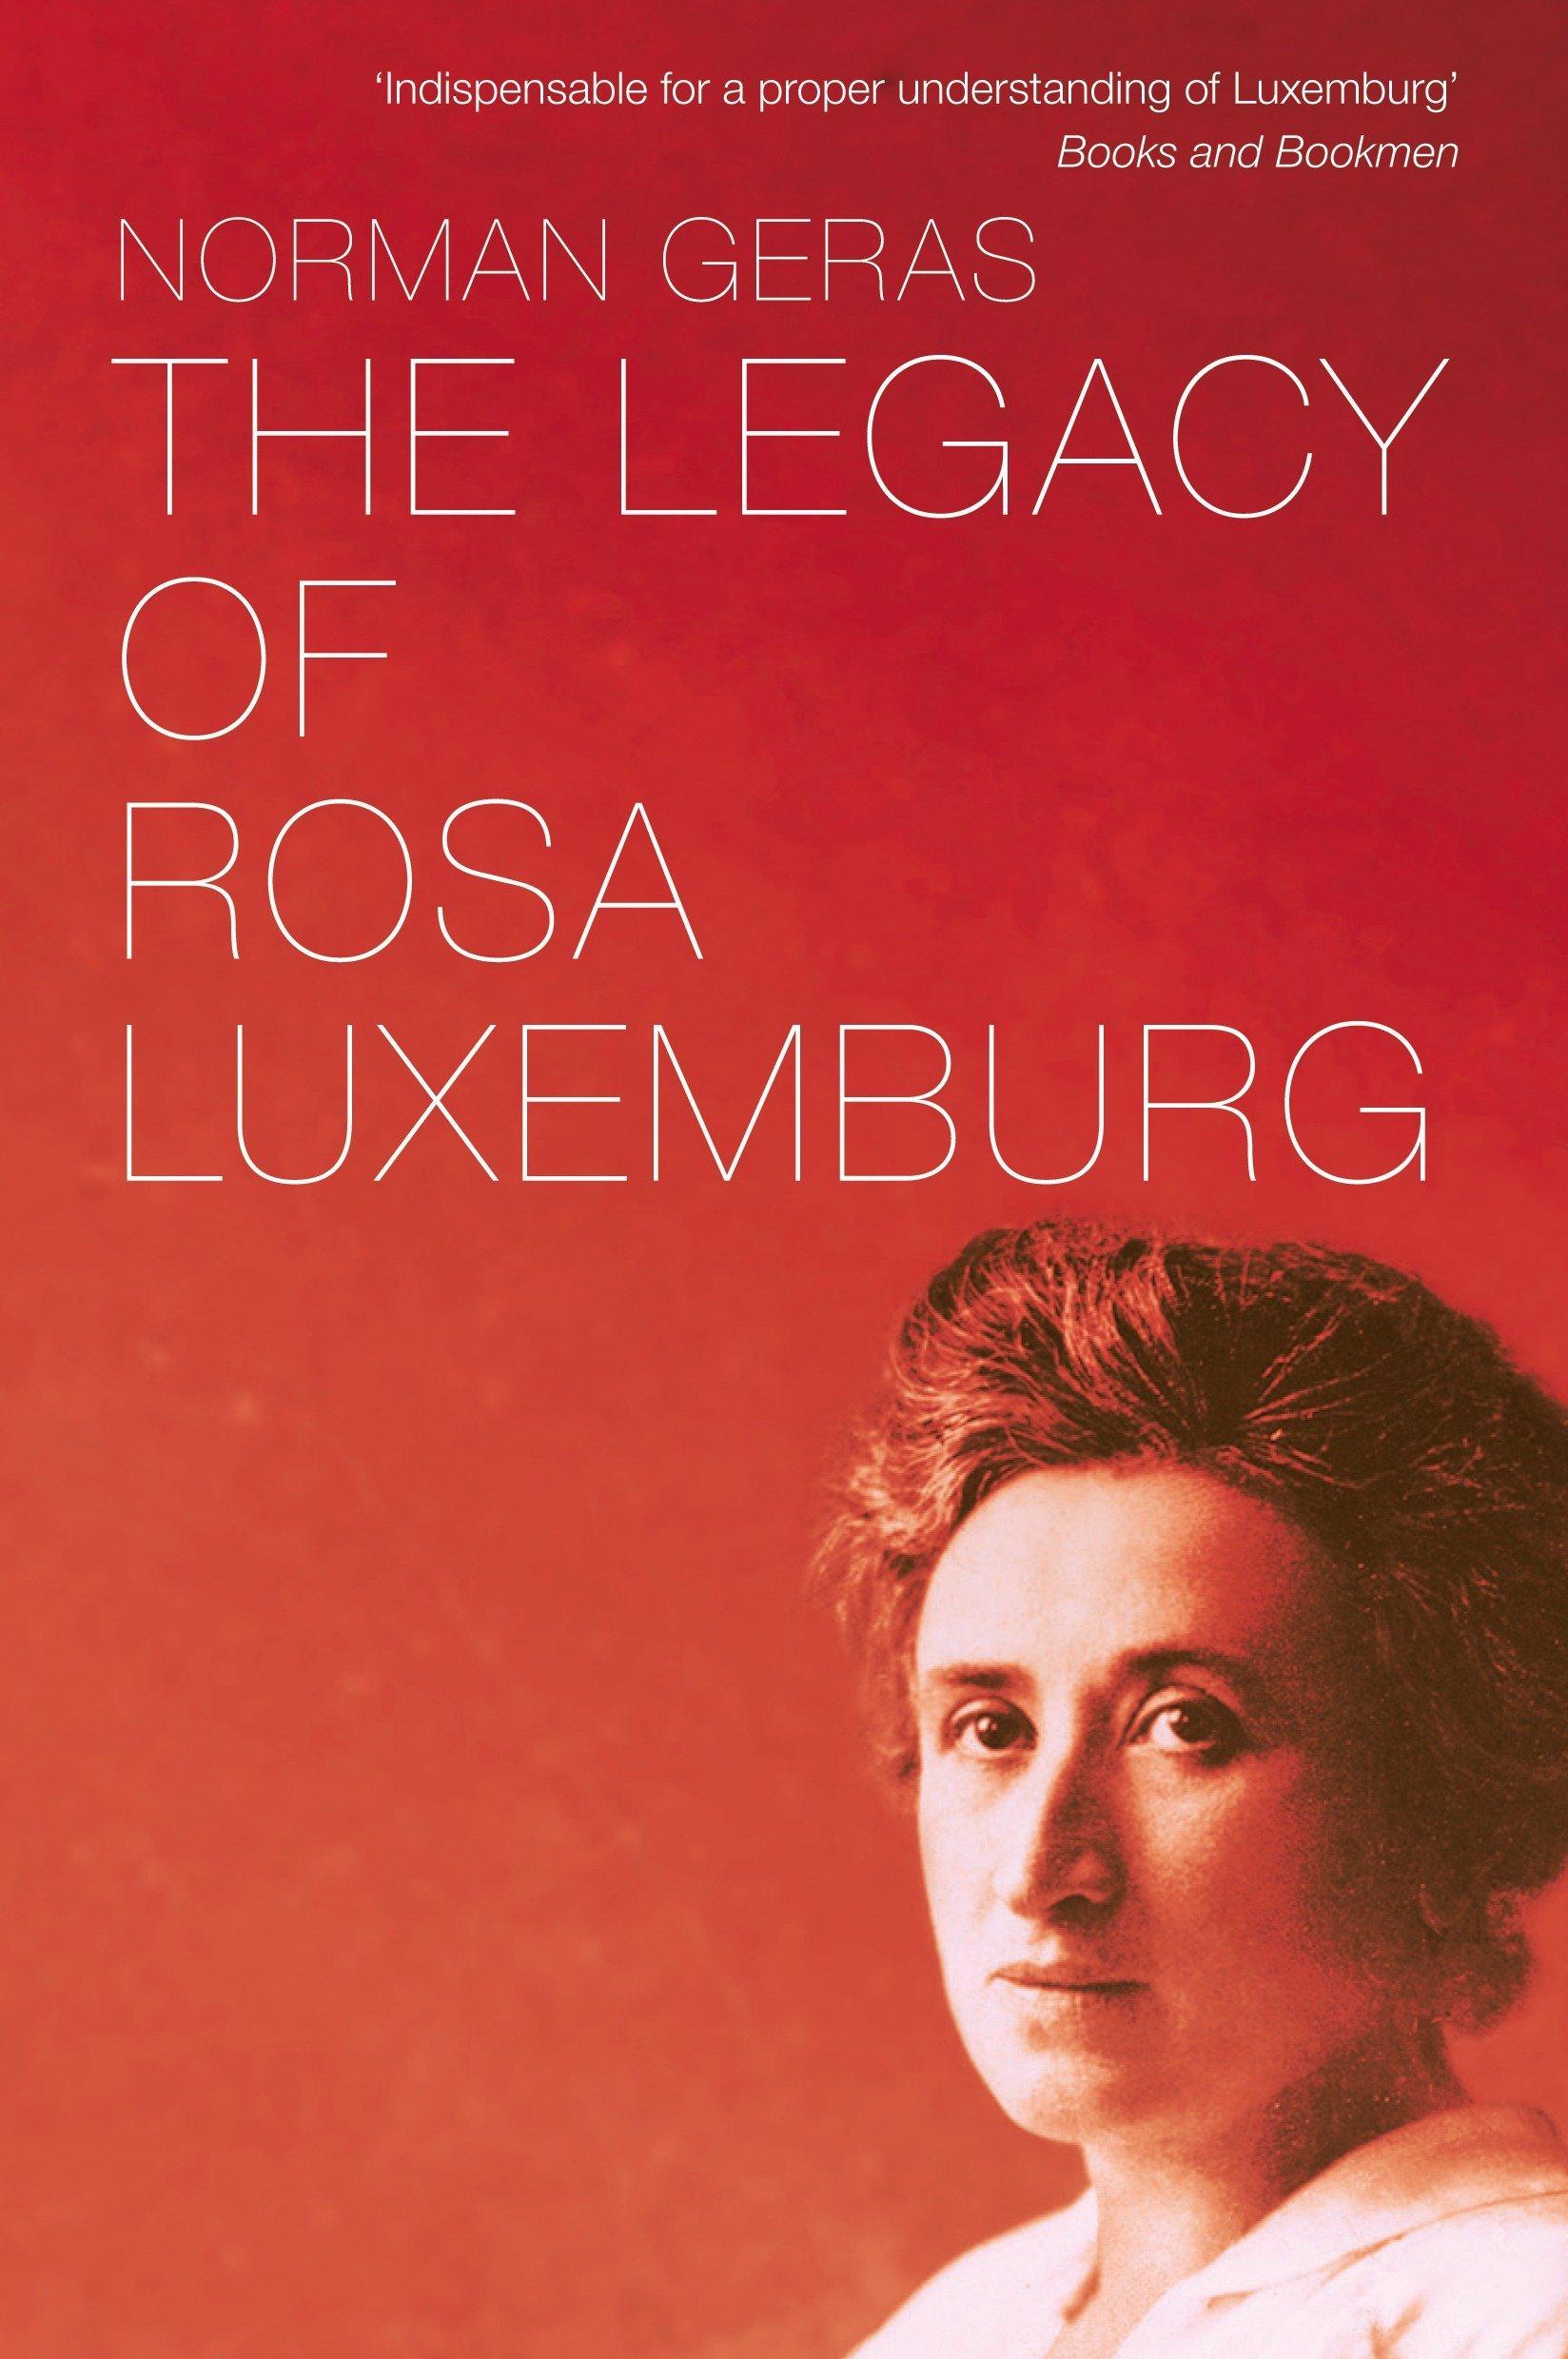 The Legacy Of Rosa Luxemburg Geras Norman 9781781688717 Amazon Com Books